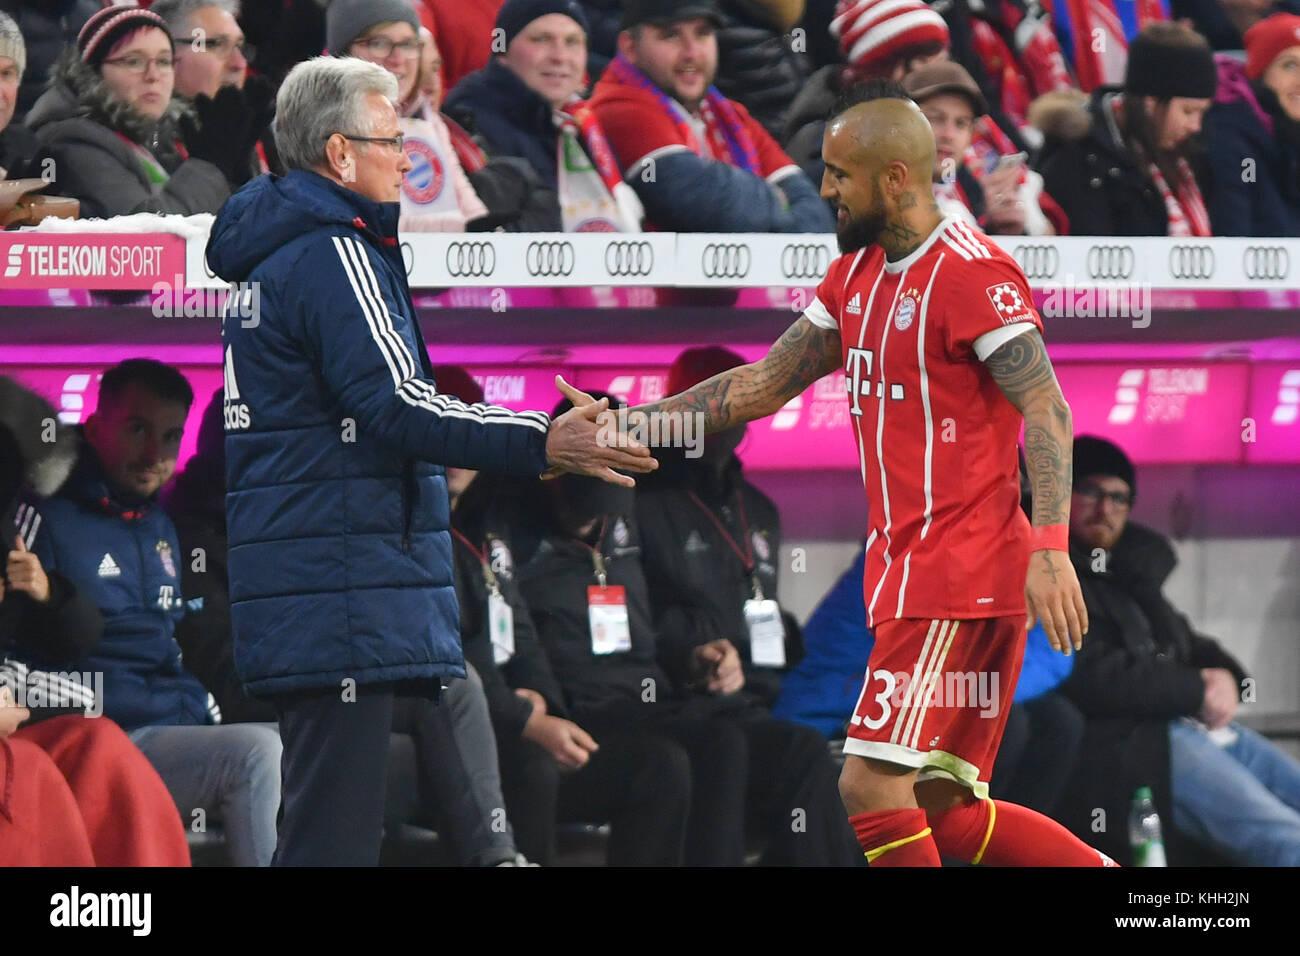 Jupp HEYNCKES (Trainer FC Bayern Munich) with Arturo VIDAL (FC Bayern Munich) after Auswechslung, Fussball 1. Bundesliga, - Stock Image